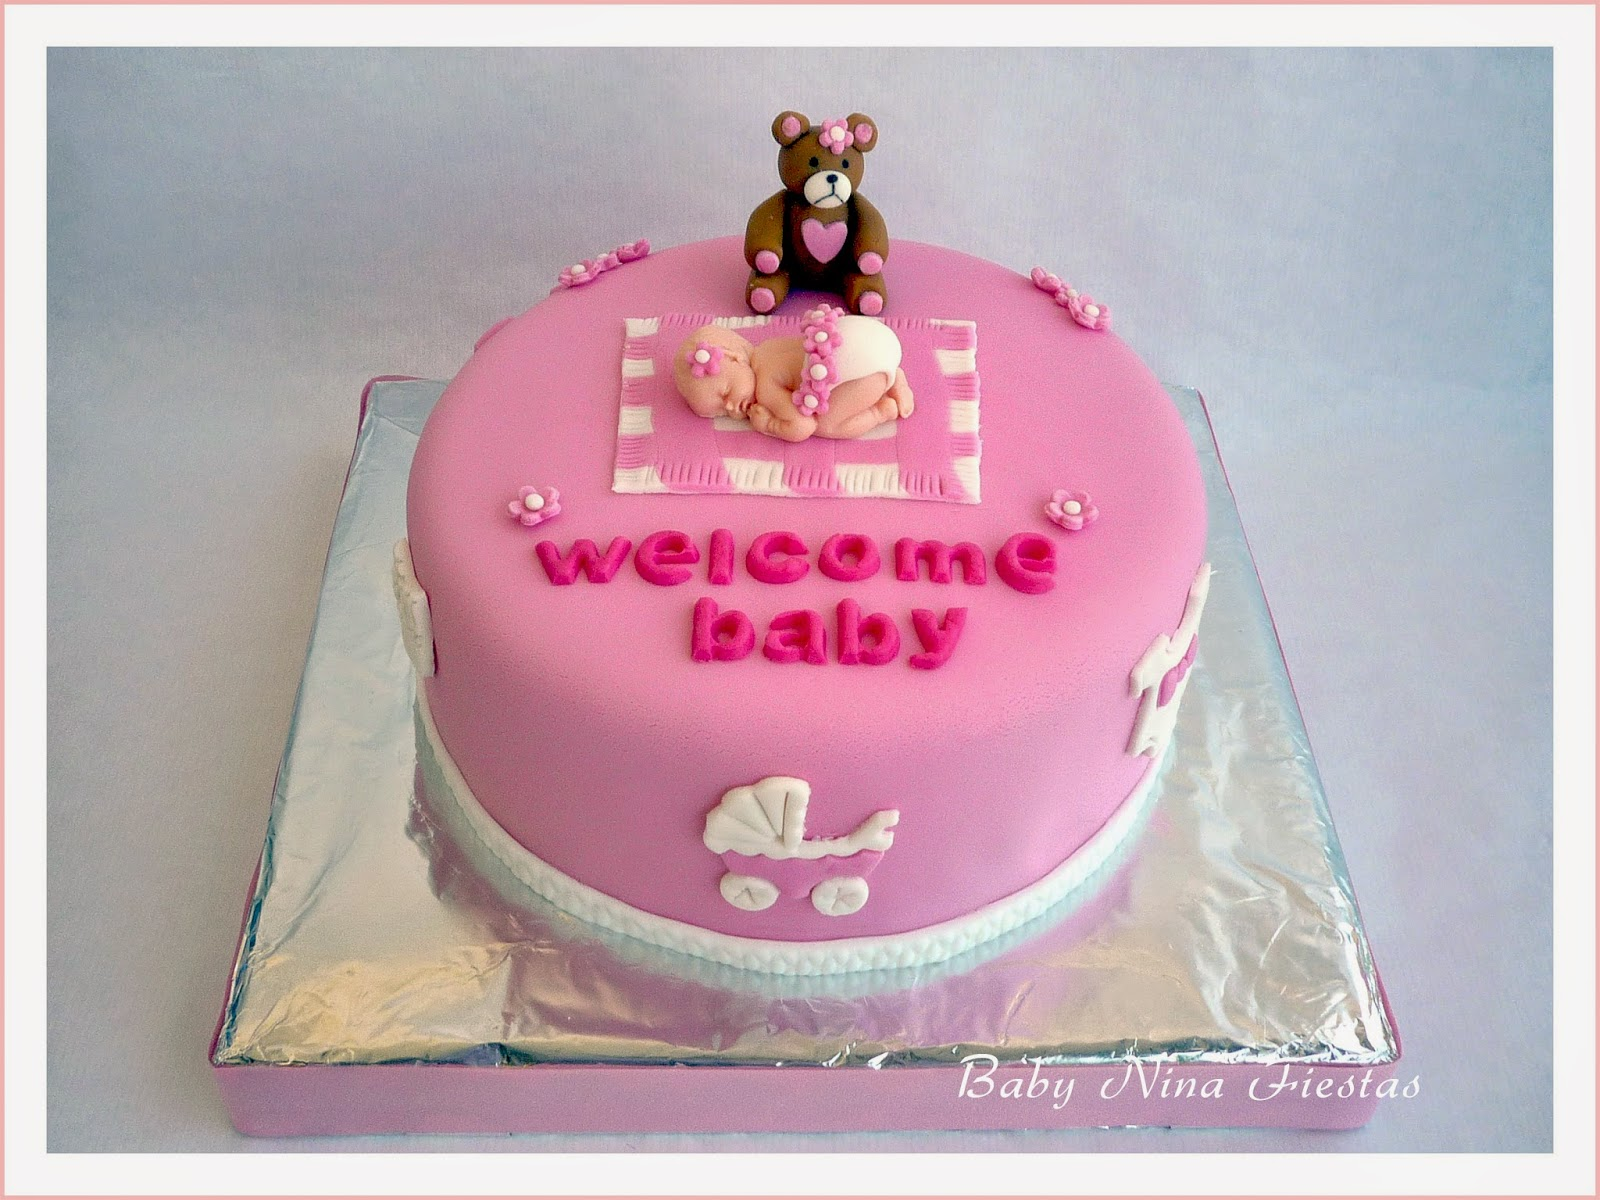 Baby nina fiestas tarta baby shower ni a - Baby shower de nina ...